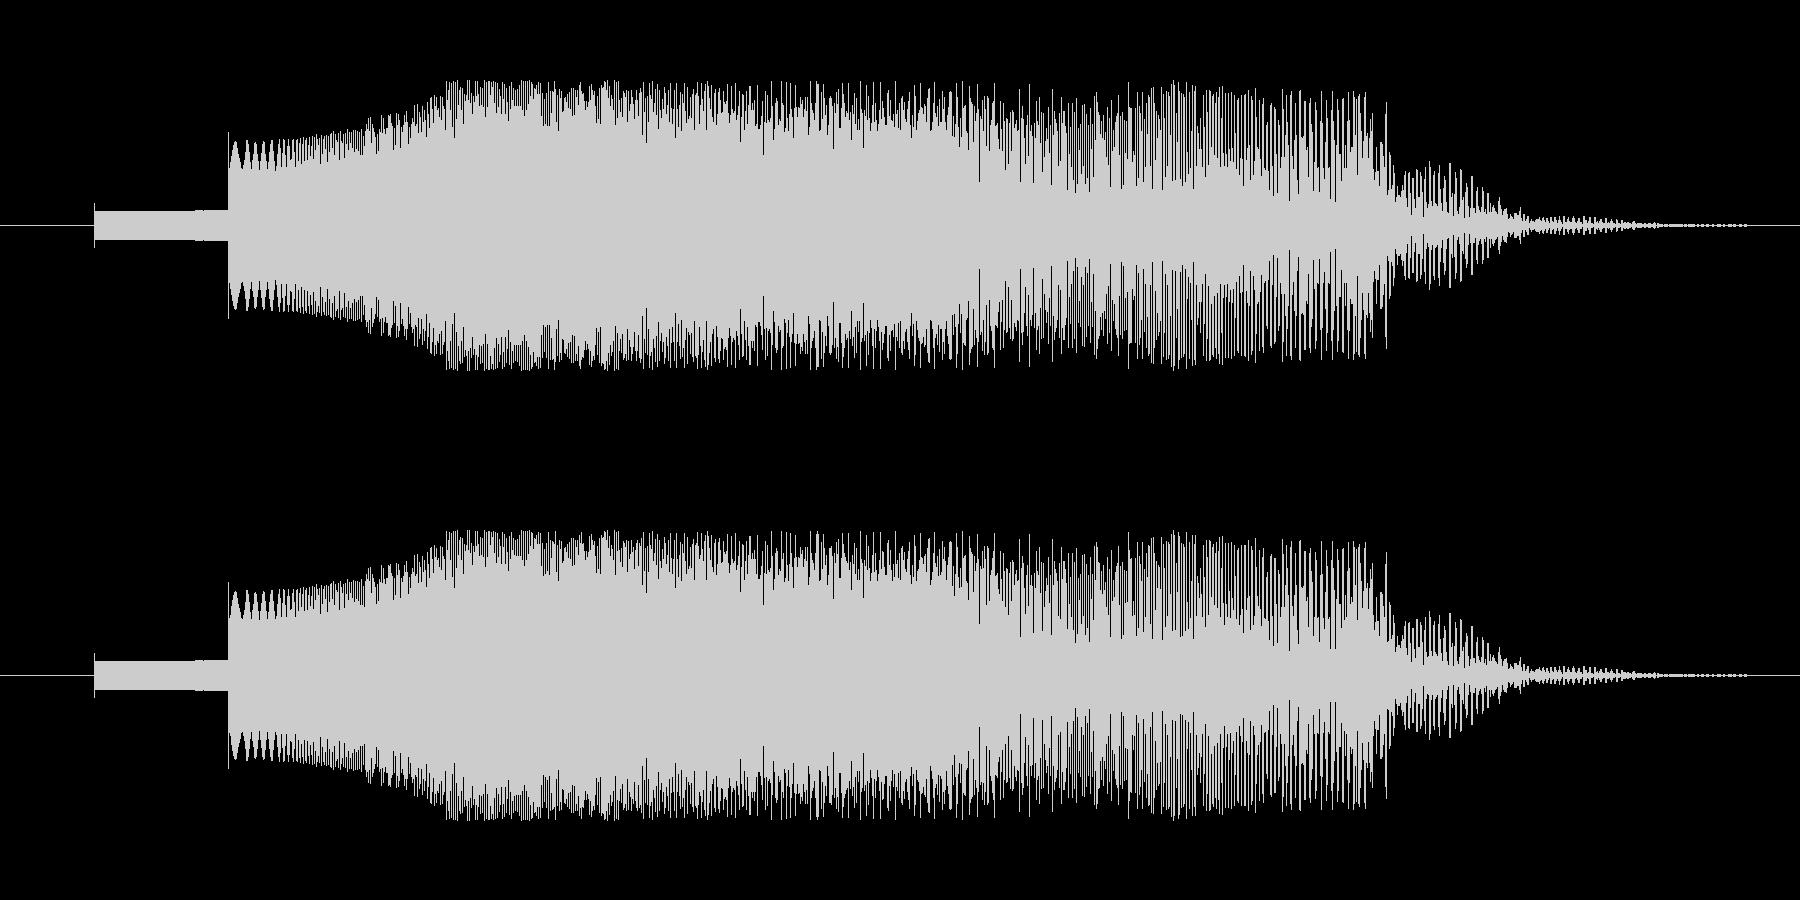 SFっぽい電子音。下降音などに。の未再生の波形